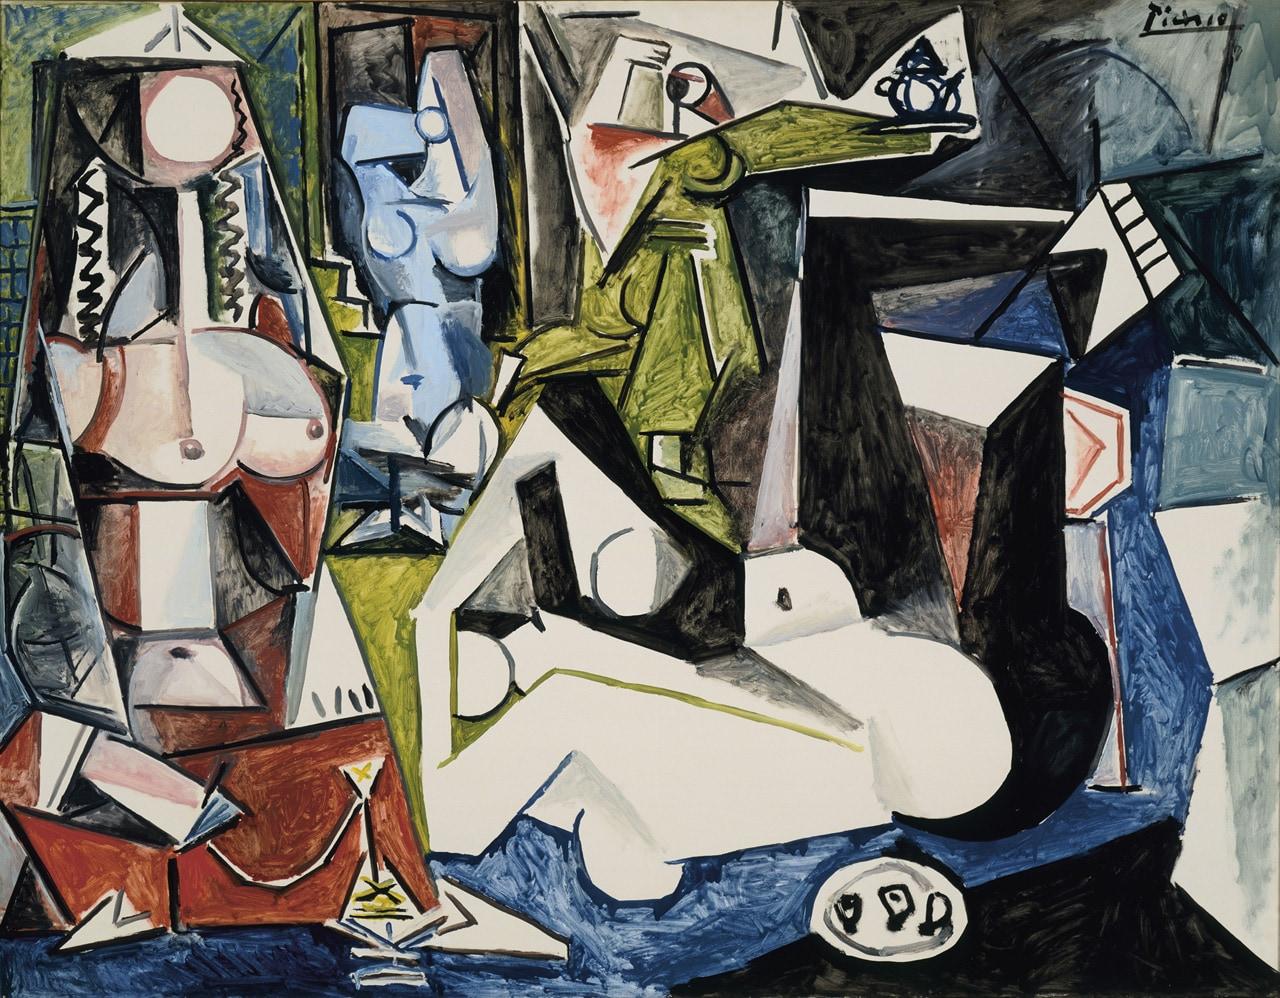 Pablo Picasso, Les Femmes d'Alger (Version N), 1955. Mildred Lane Kemper Art Museum, Washington University St. Louis. University purchase, 1960. Image: VG Bild-Kunst, Bonn 2021